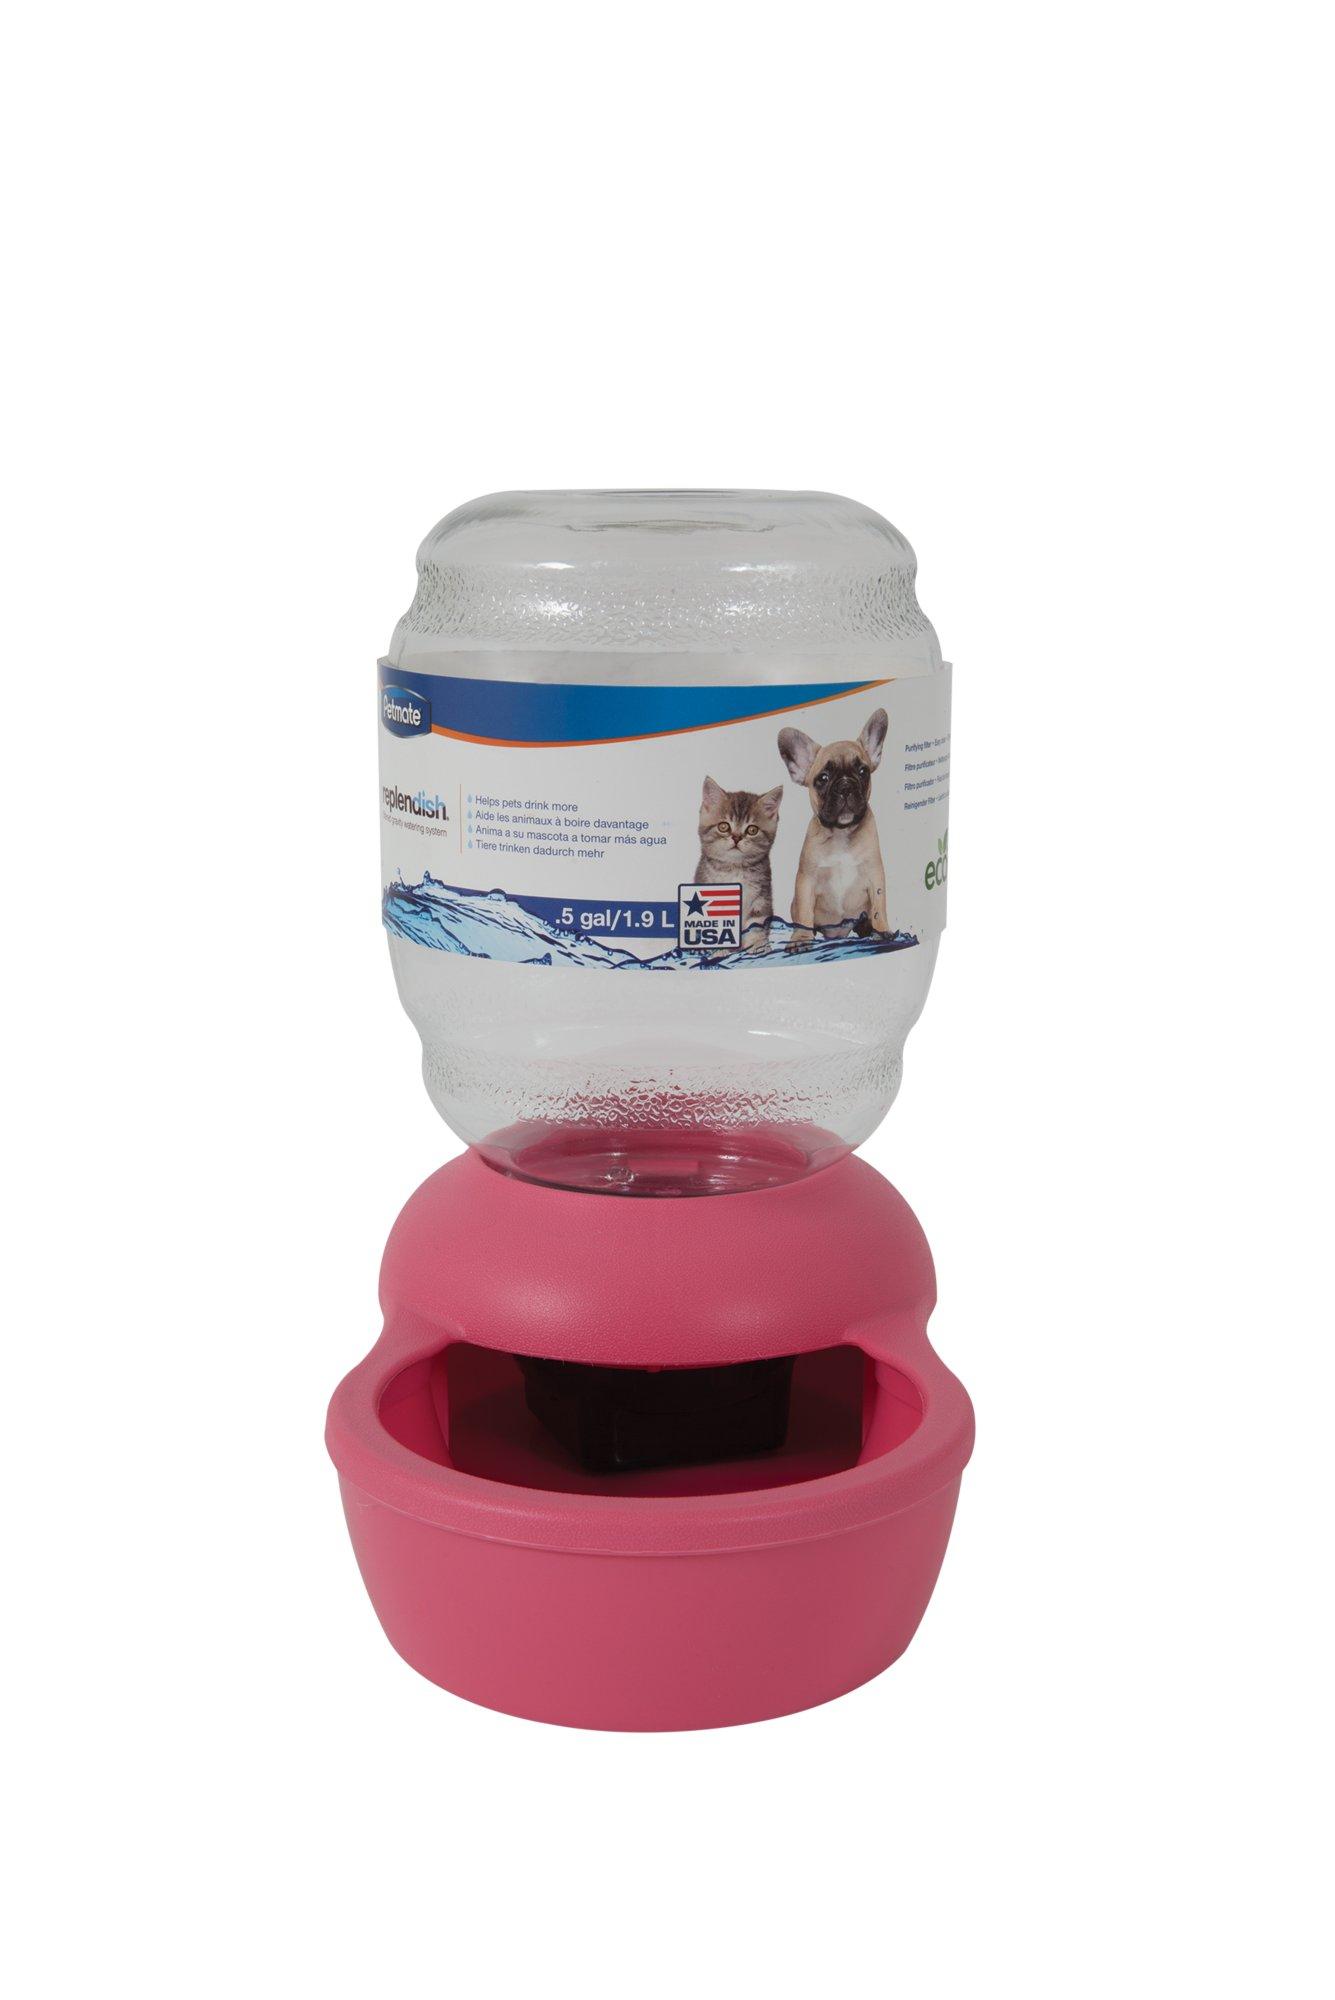 Petmate Replendish Gravity Waterer Pink Dog Bowl